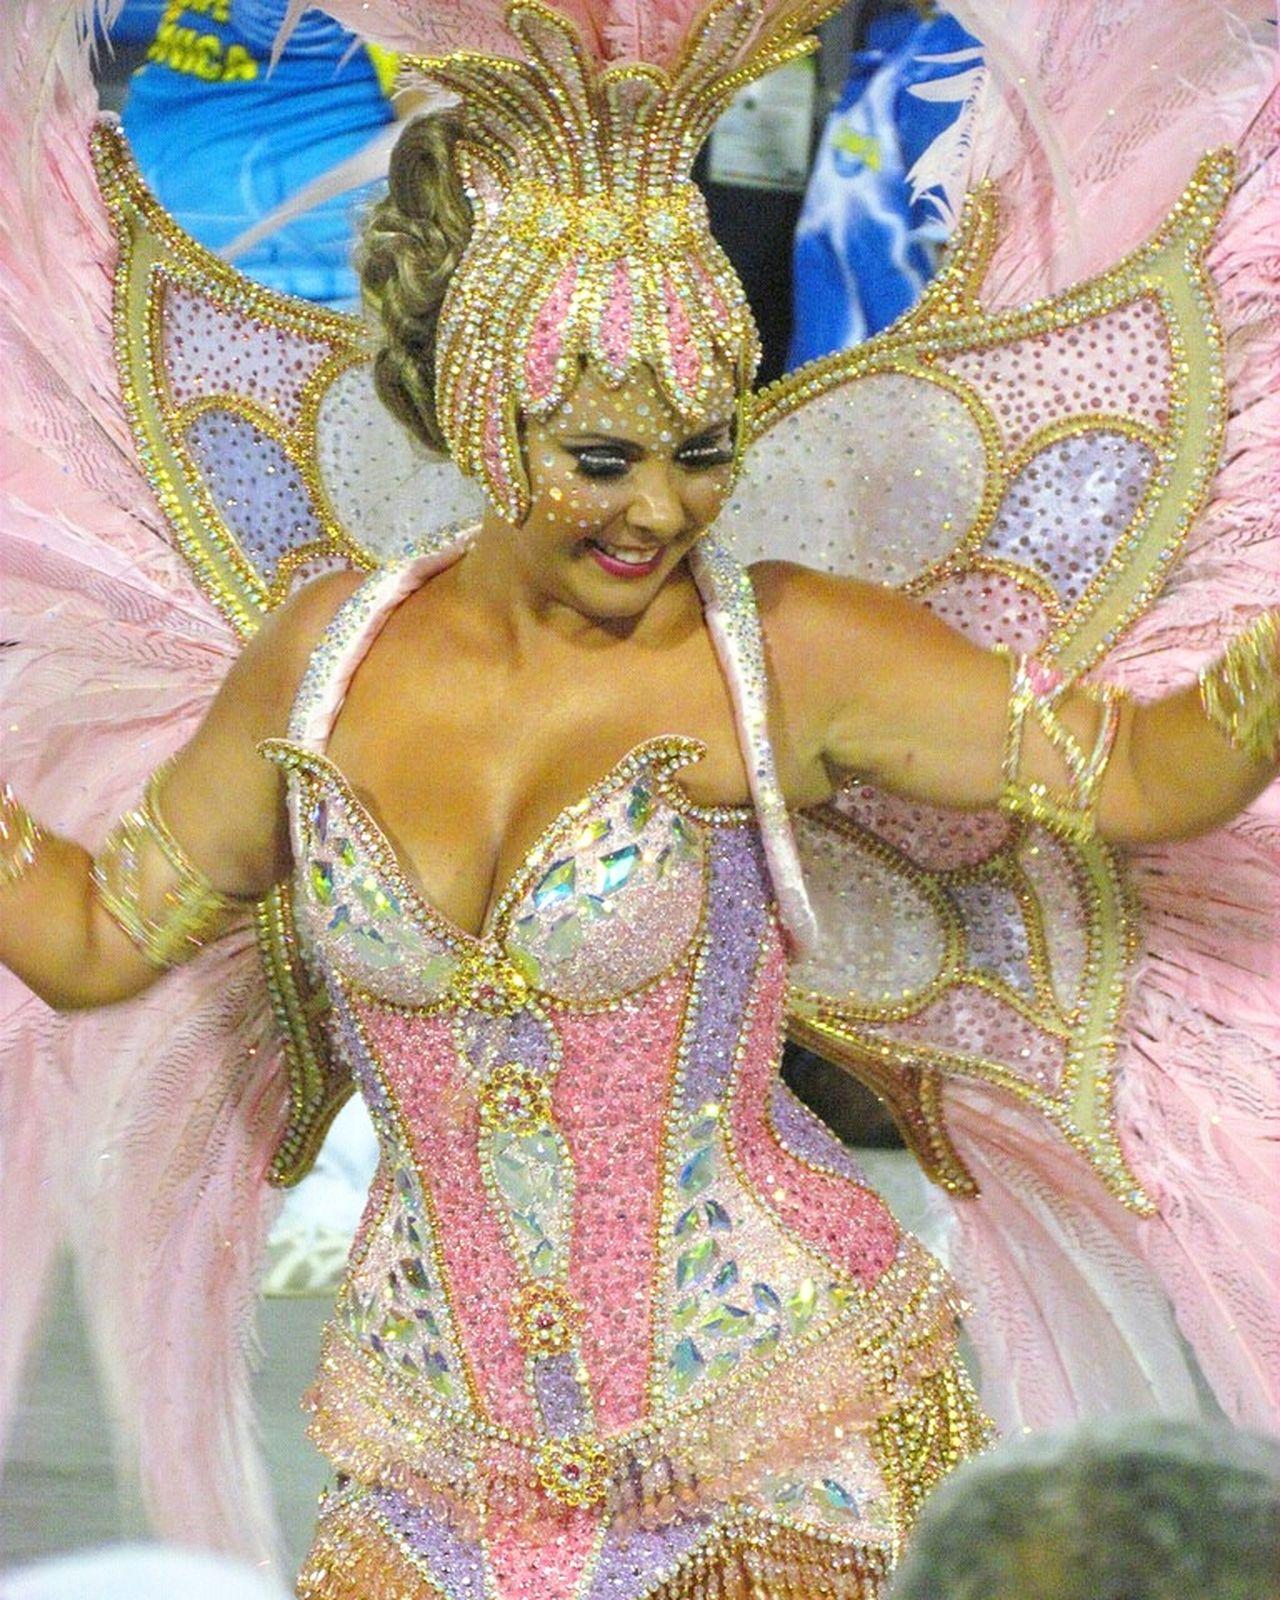 Carioca Selusava Brasil ♥ Carnival Carnaval Brasil Brazil Colours Of Carnival Cariocadagema Carioca Girl Enjoying Life parade Taking Photos brasil Brazil ❤